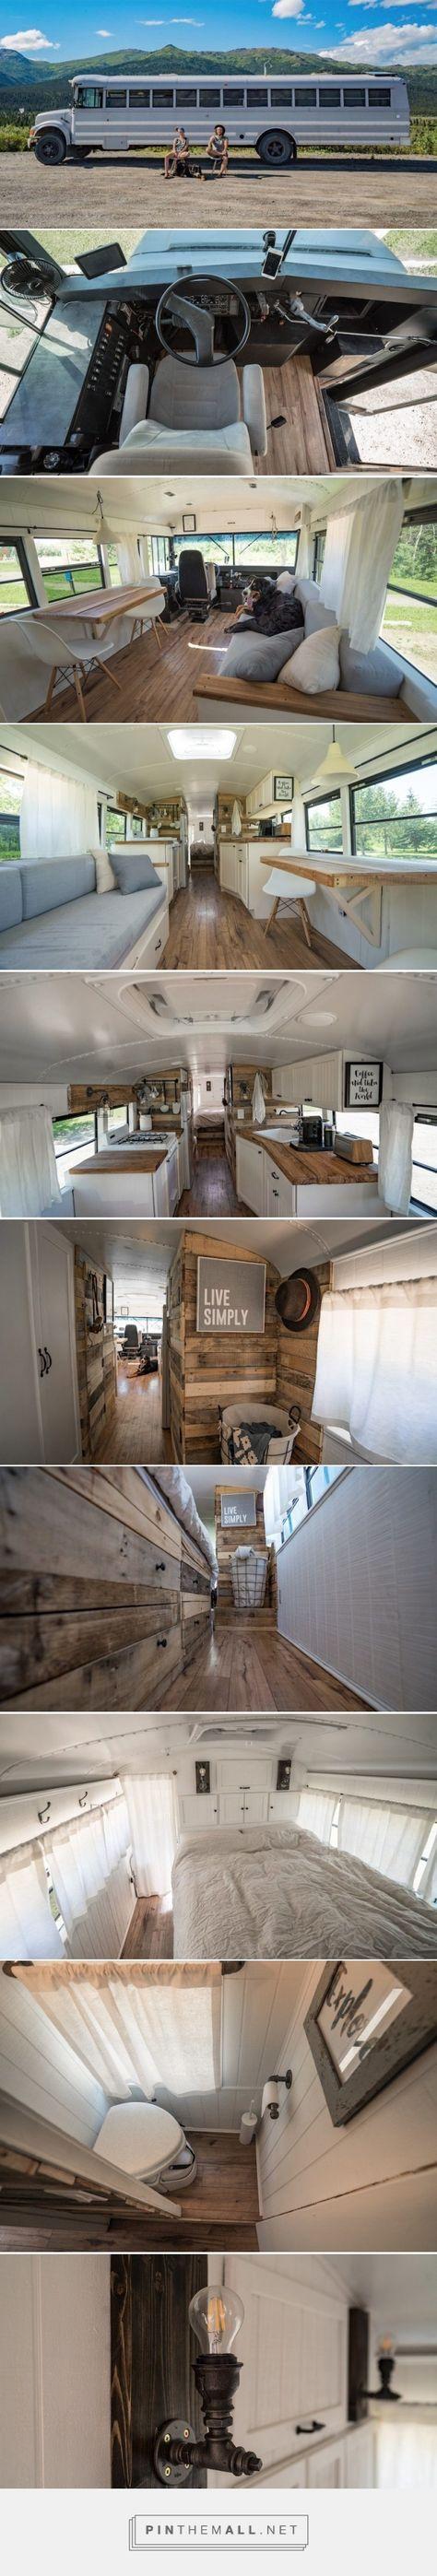 Artsy Couple Turned a School Bus into a Loft on Wheels - Tiny House Blog - created via https://pinthemall.net